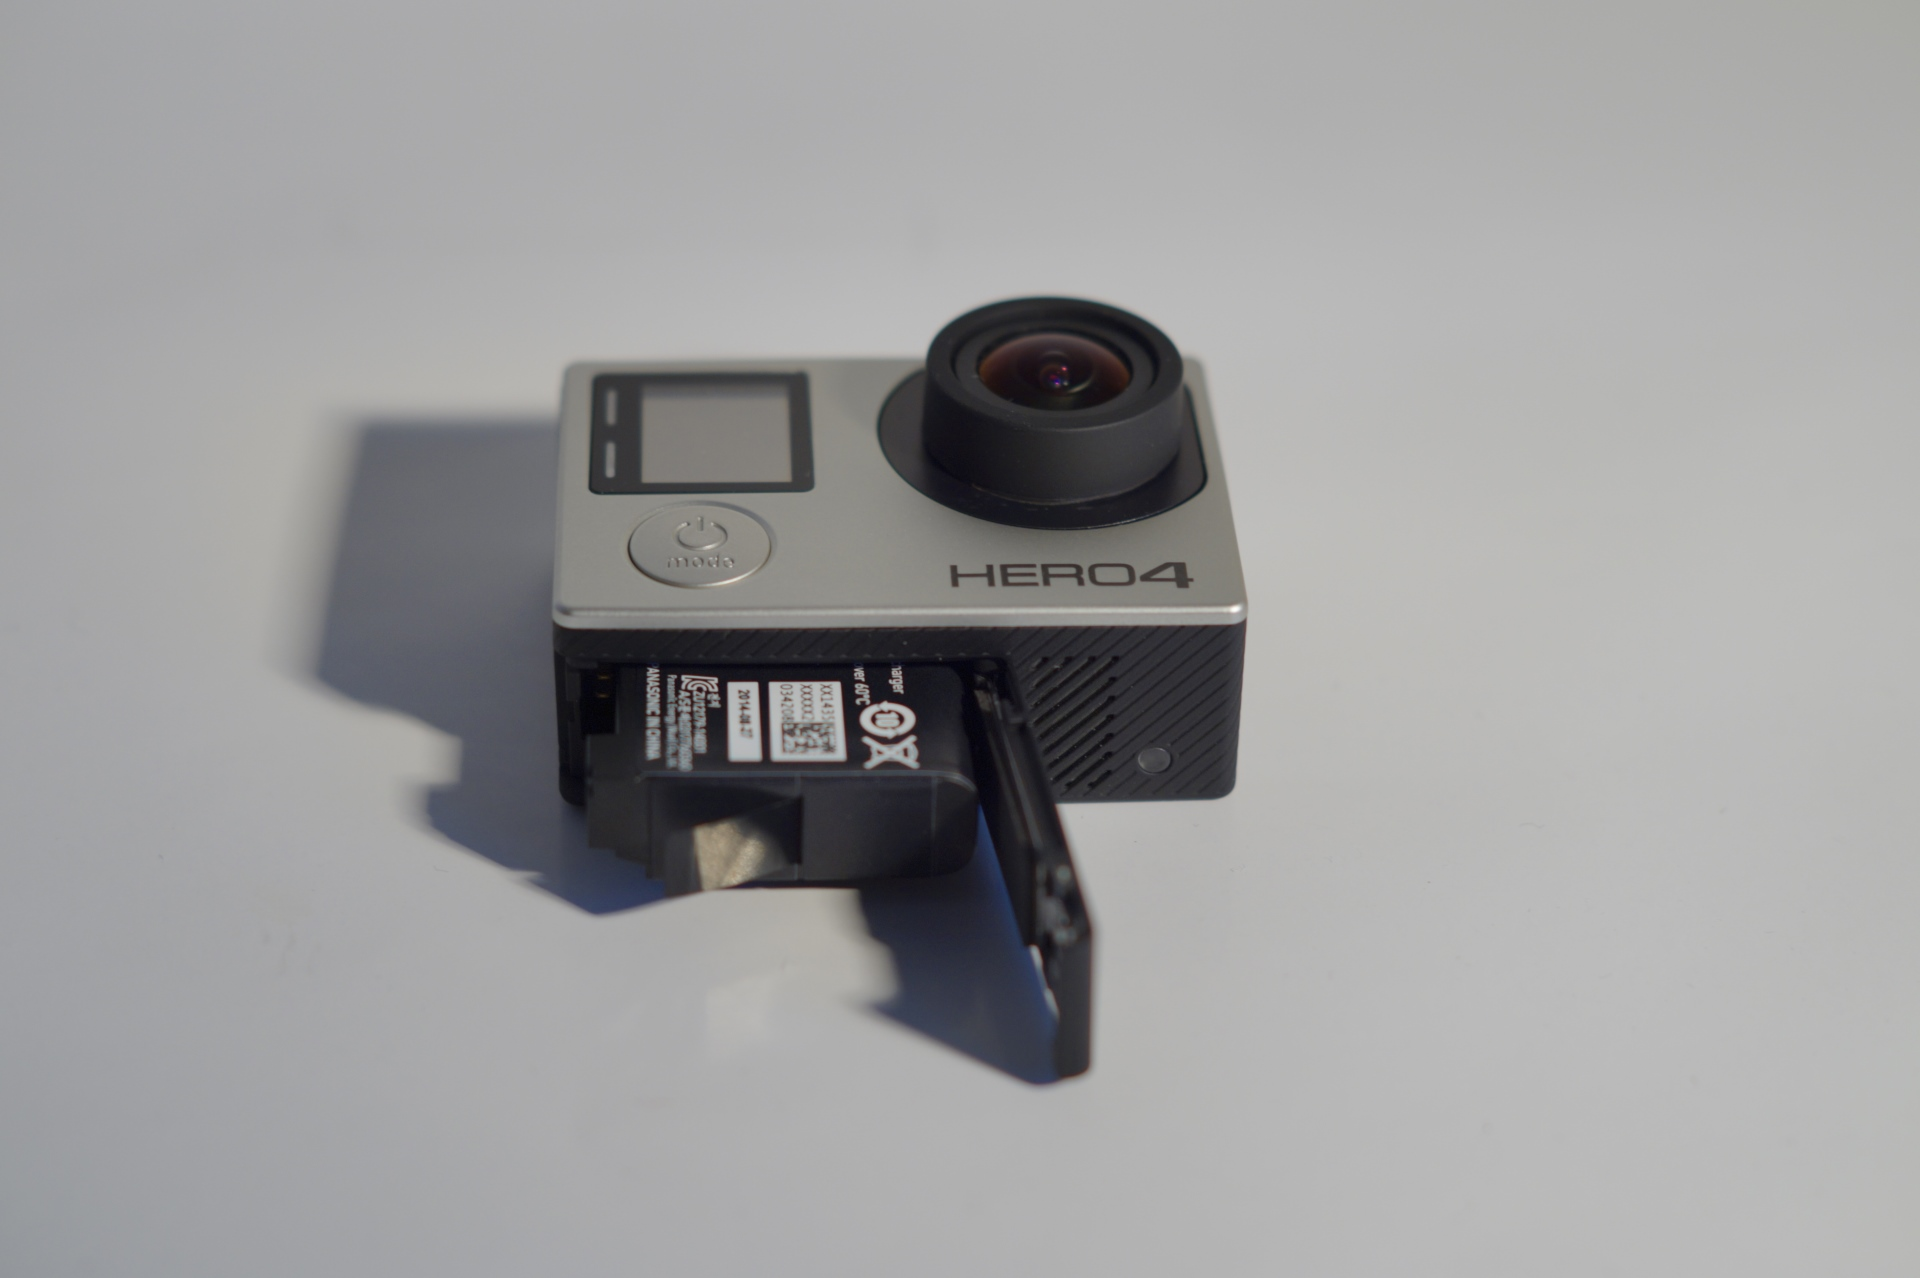 gopro hero 4 silver test action kamera review bergreif. Black Bedroom Furniture Sets. Home Design Ideas